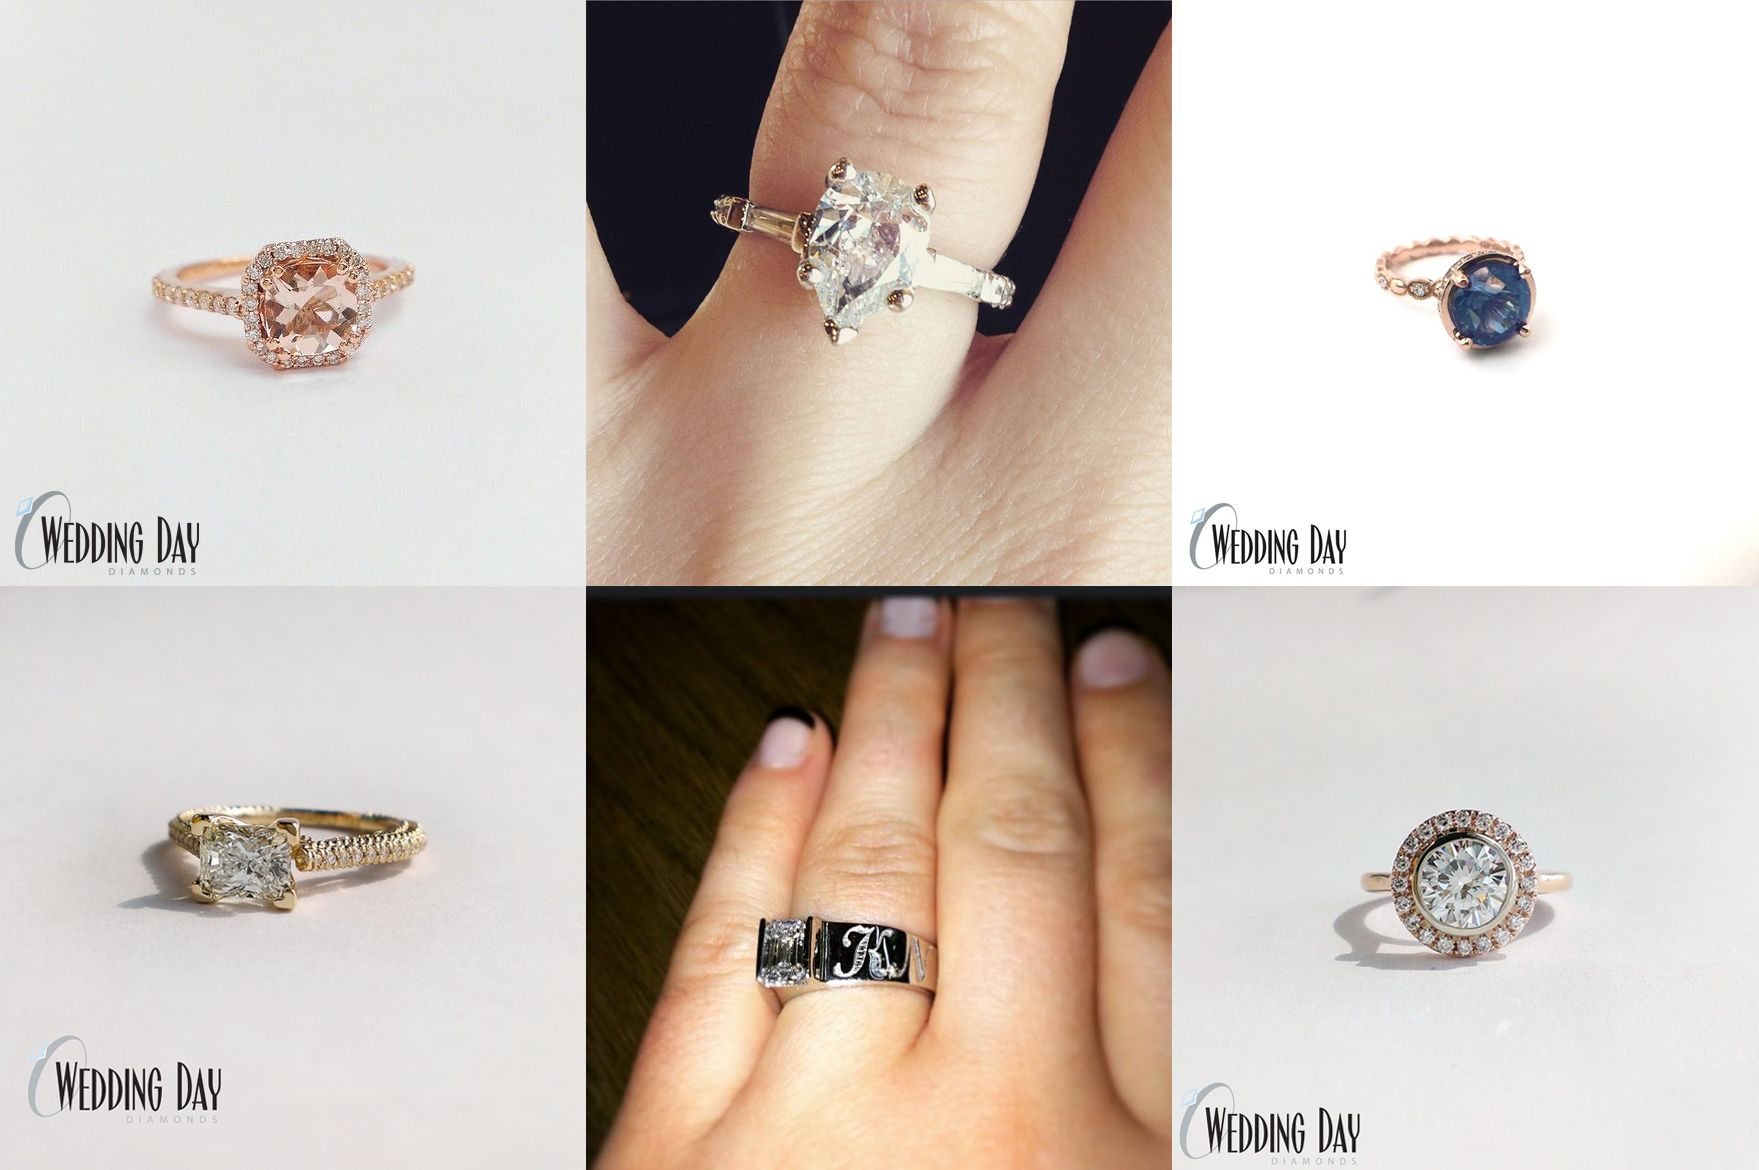 Custom Design Engagement Ring Wedding day diamonds